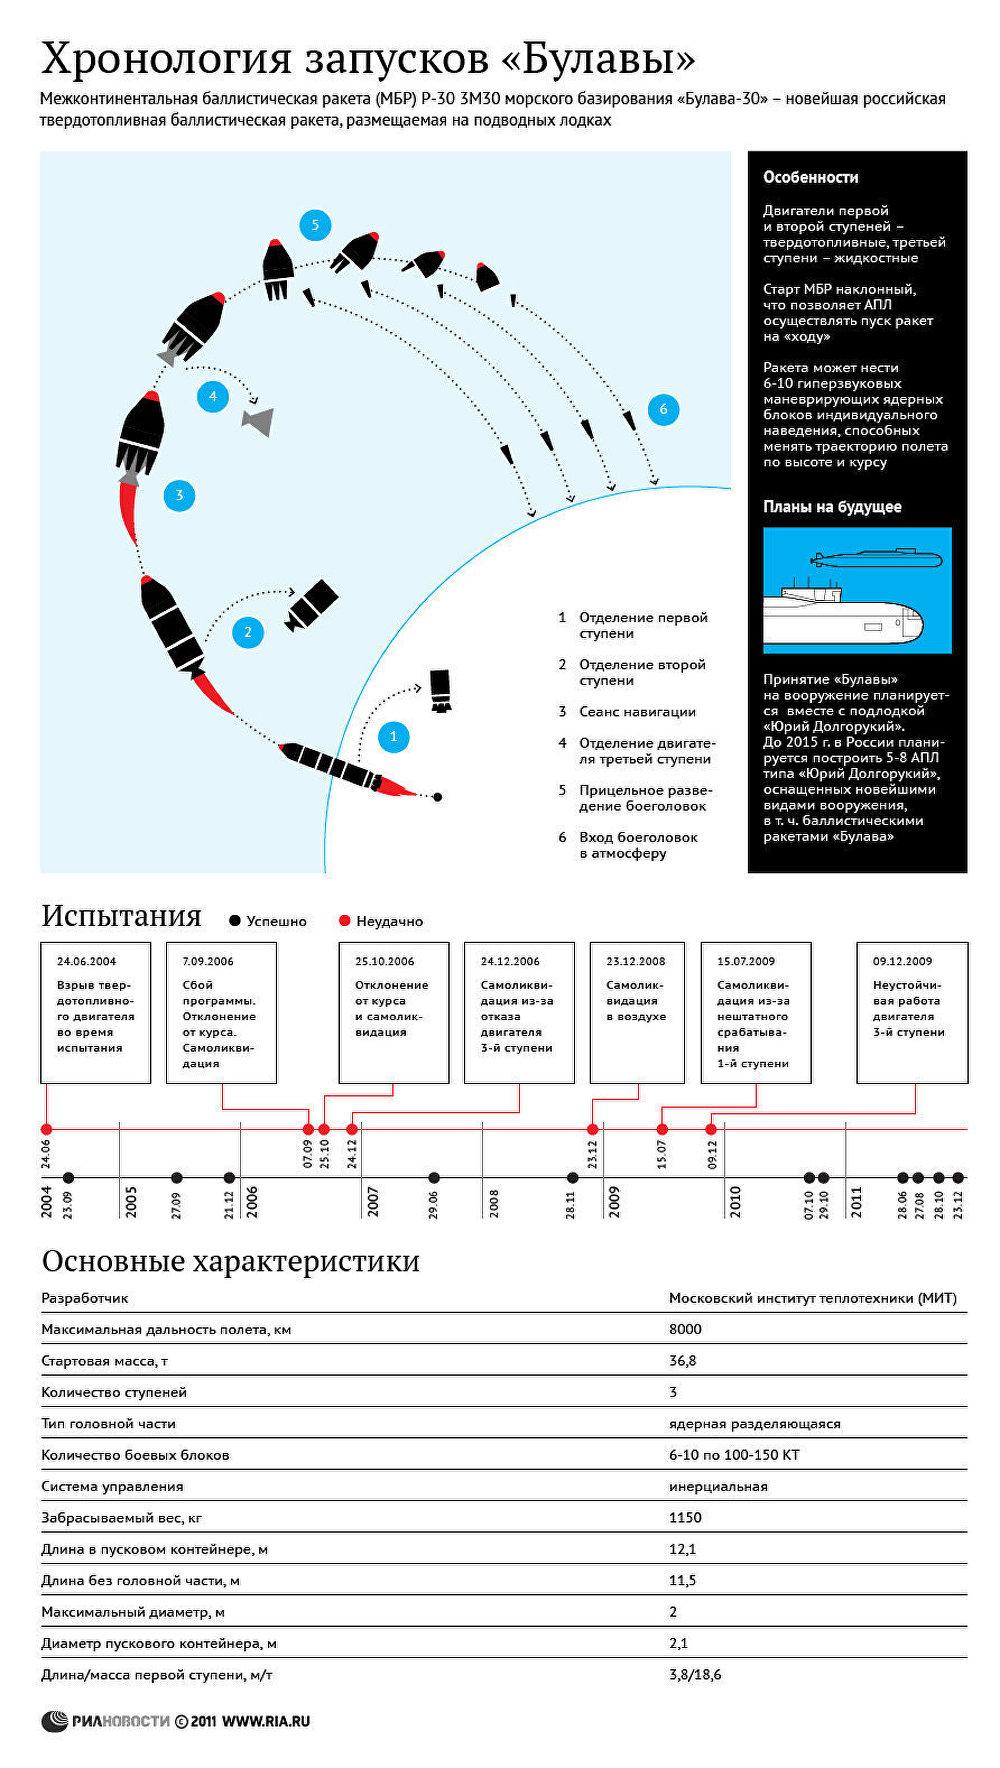 Хронология запусков Булавы